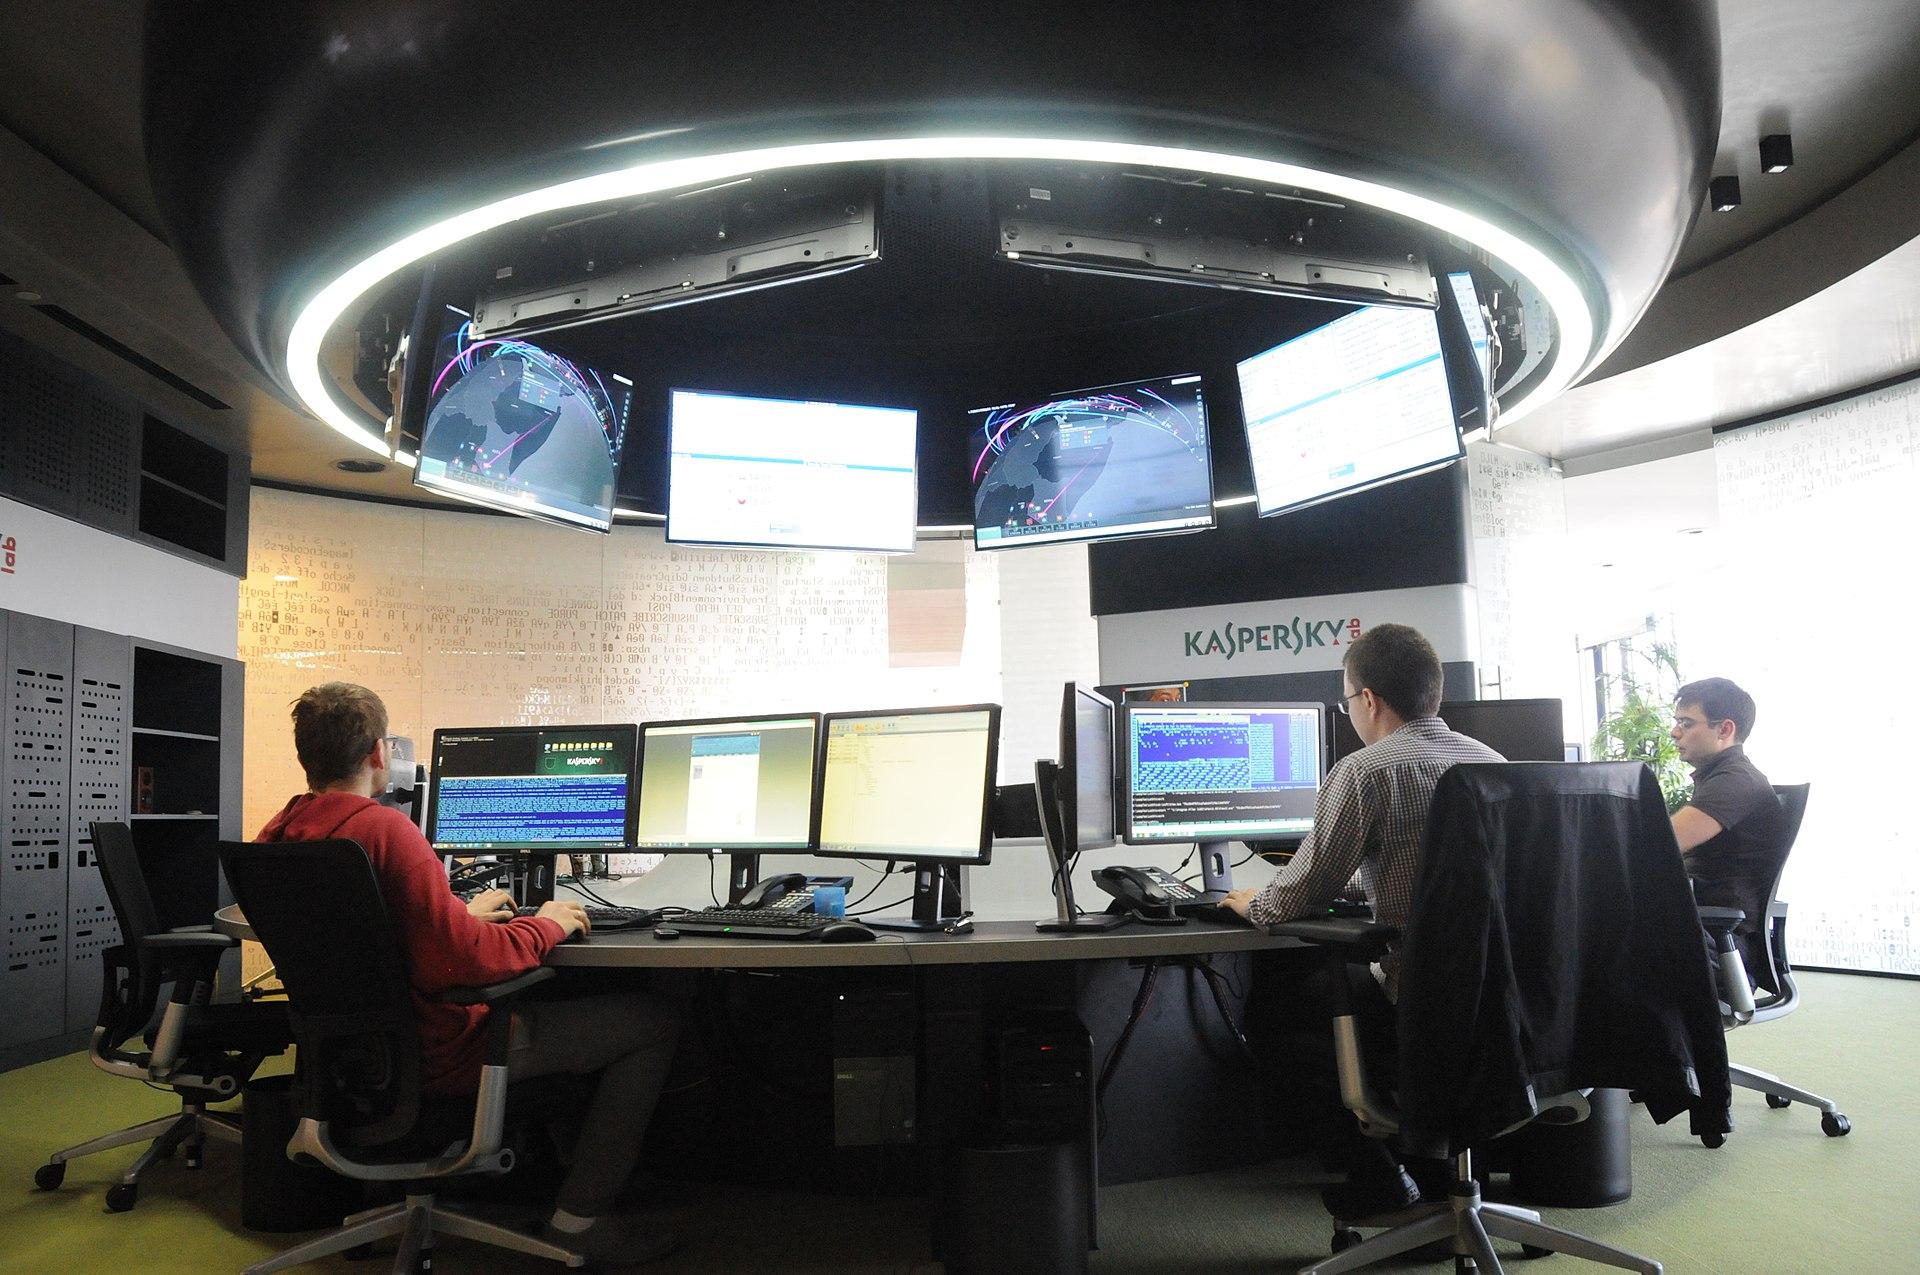 Kaspersky Lab Wikipedia